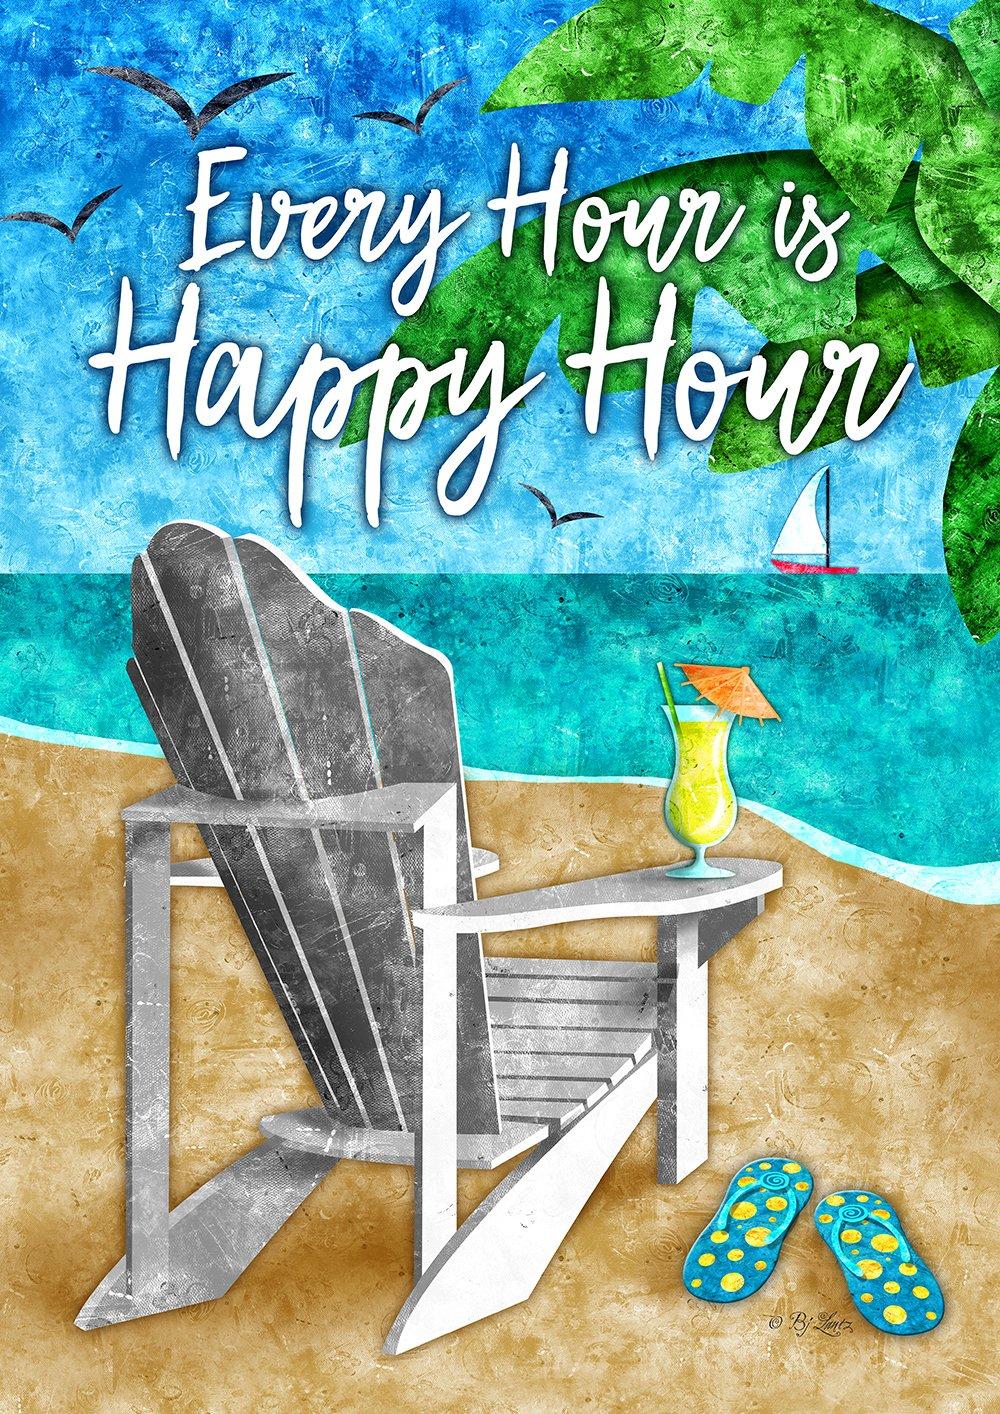 Toland Home Garden Happy Hour Beach 12.5 x 18 Inch Decorative Tropical Summer Adirondack Cocktail Garden Flag